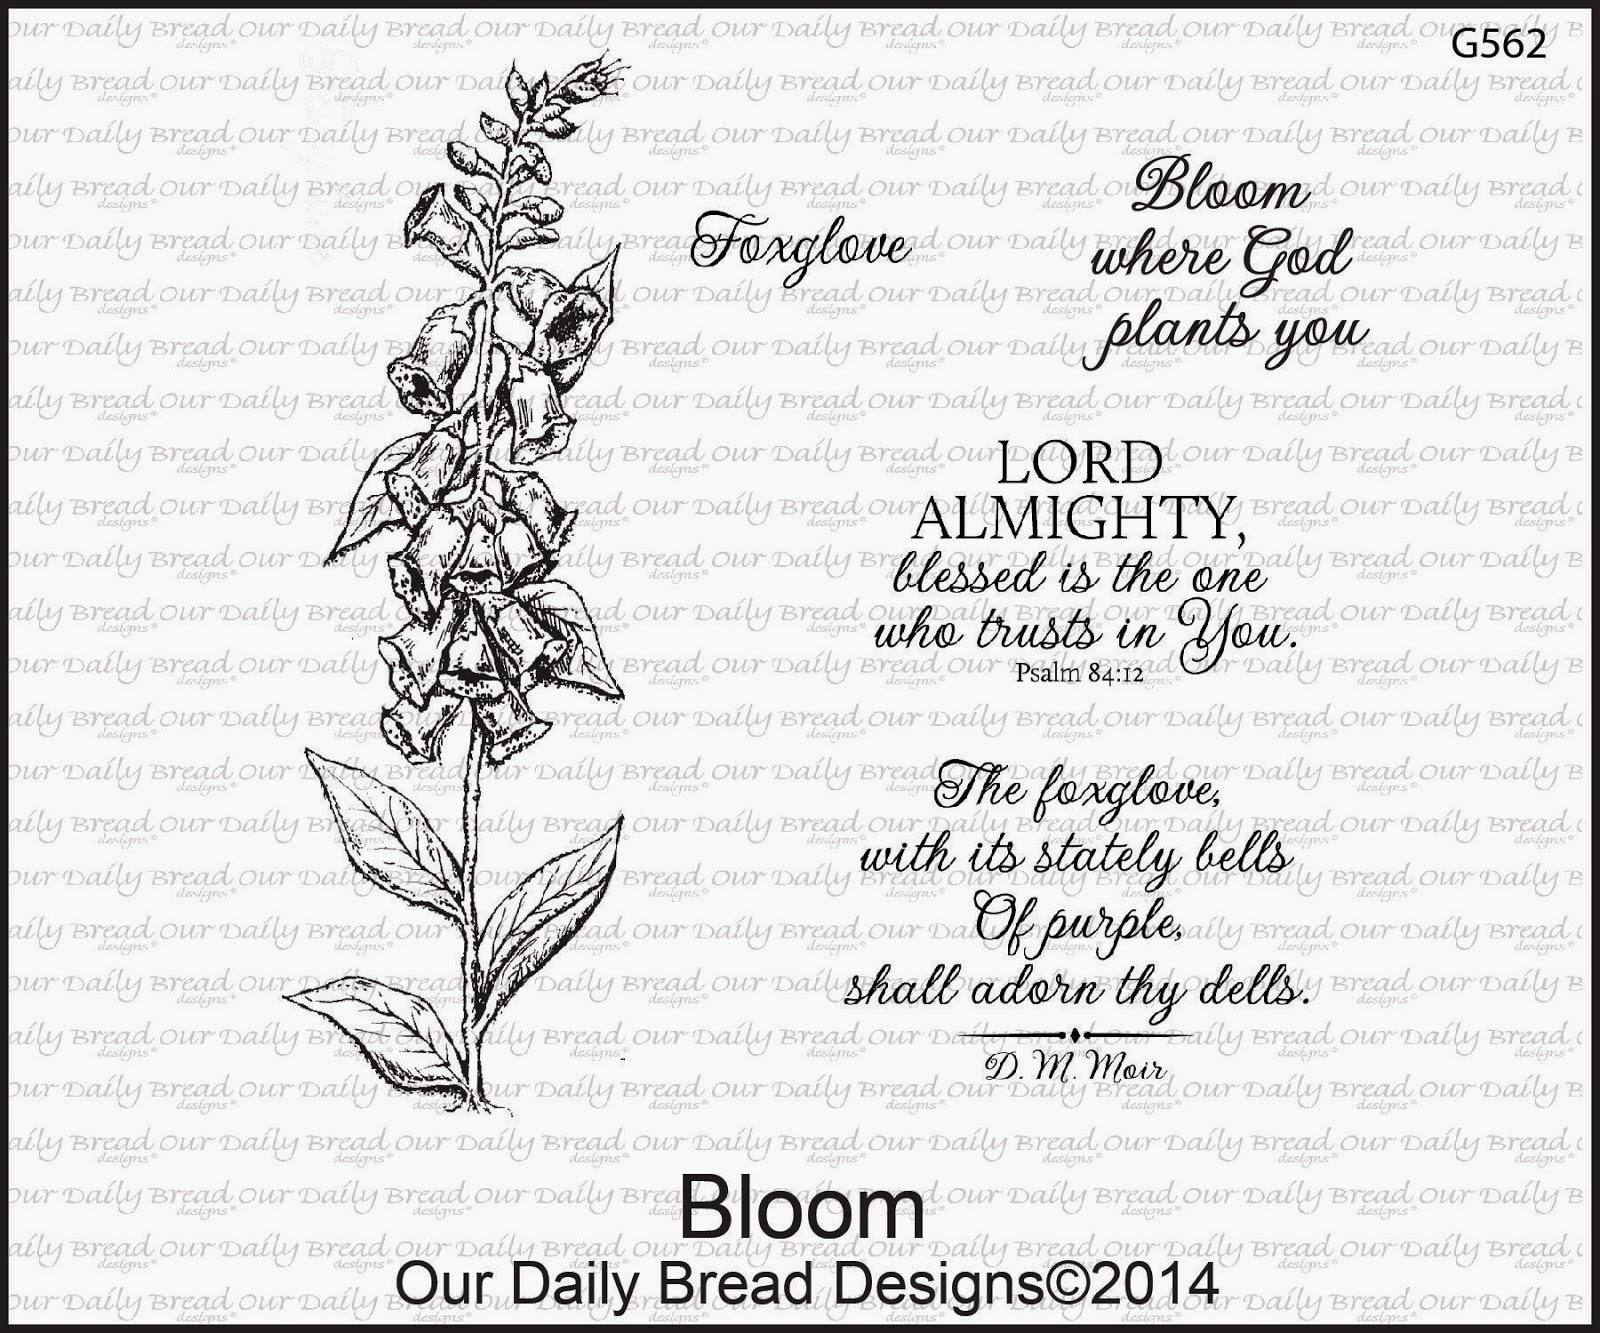 ODBD Bloom